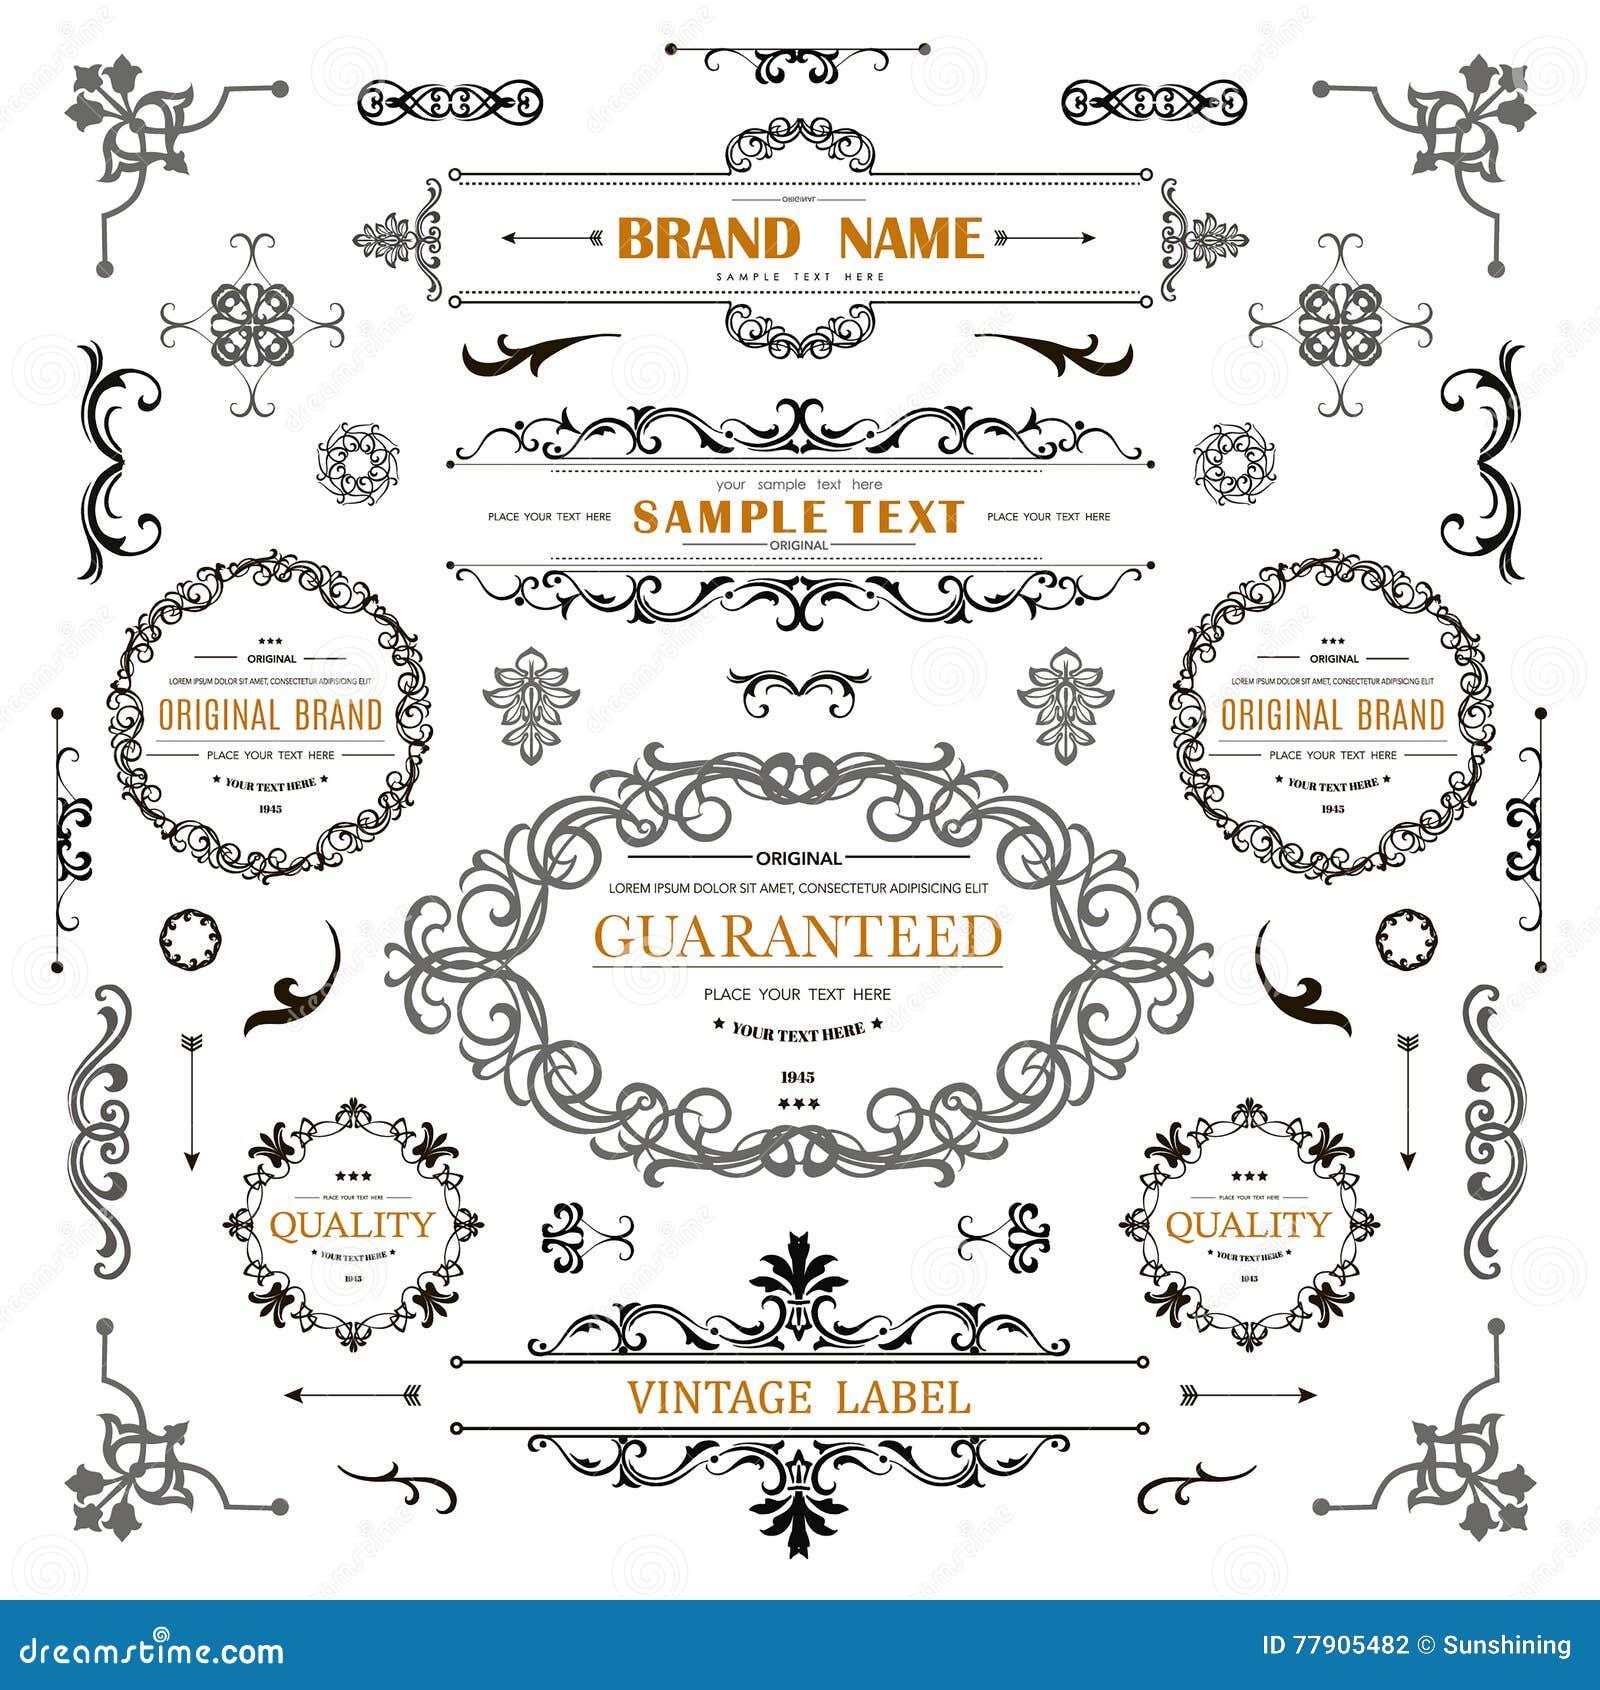 Vintage decorations curl elements.Classical calligraphic ornaments,frames,labels